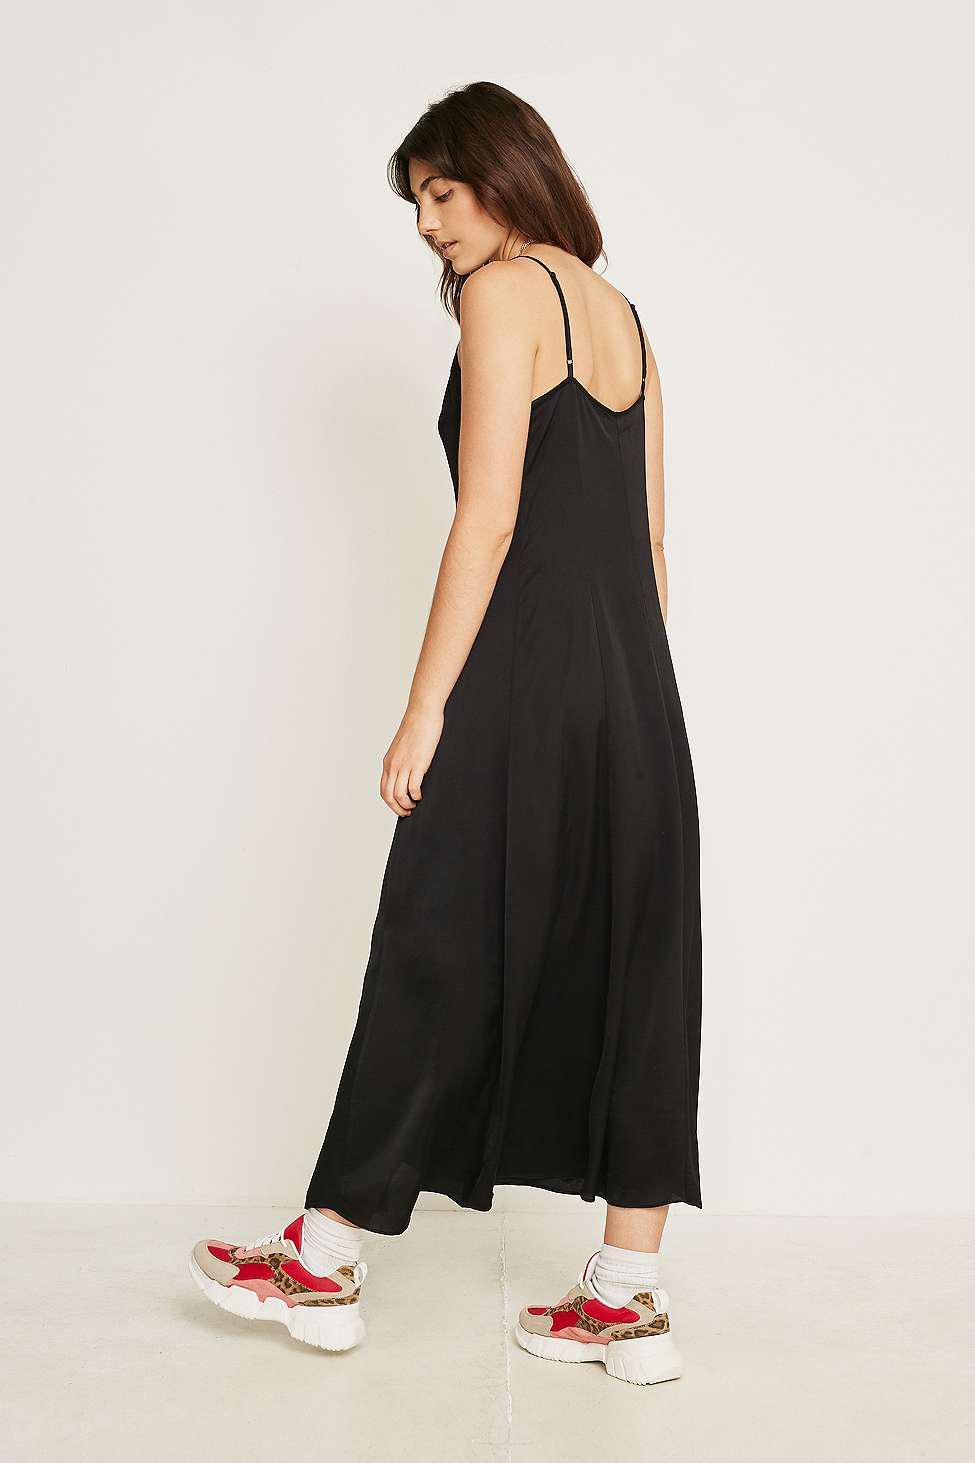 9e85c4f43c9 Urban Outfitters Uo Demi Button-through Midi Slip Dress - Womens S ...